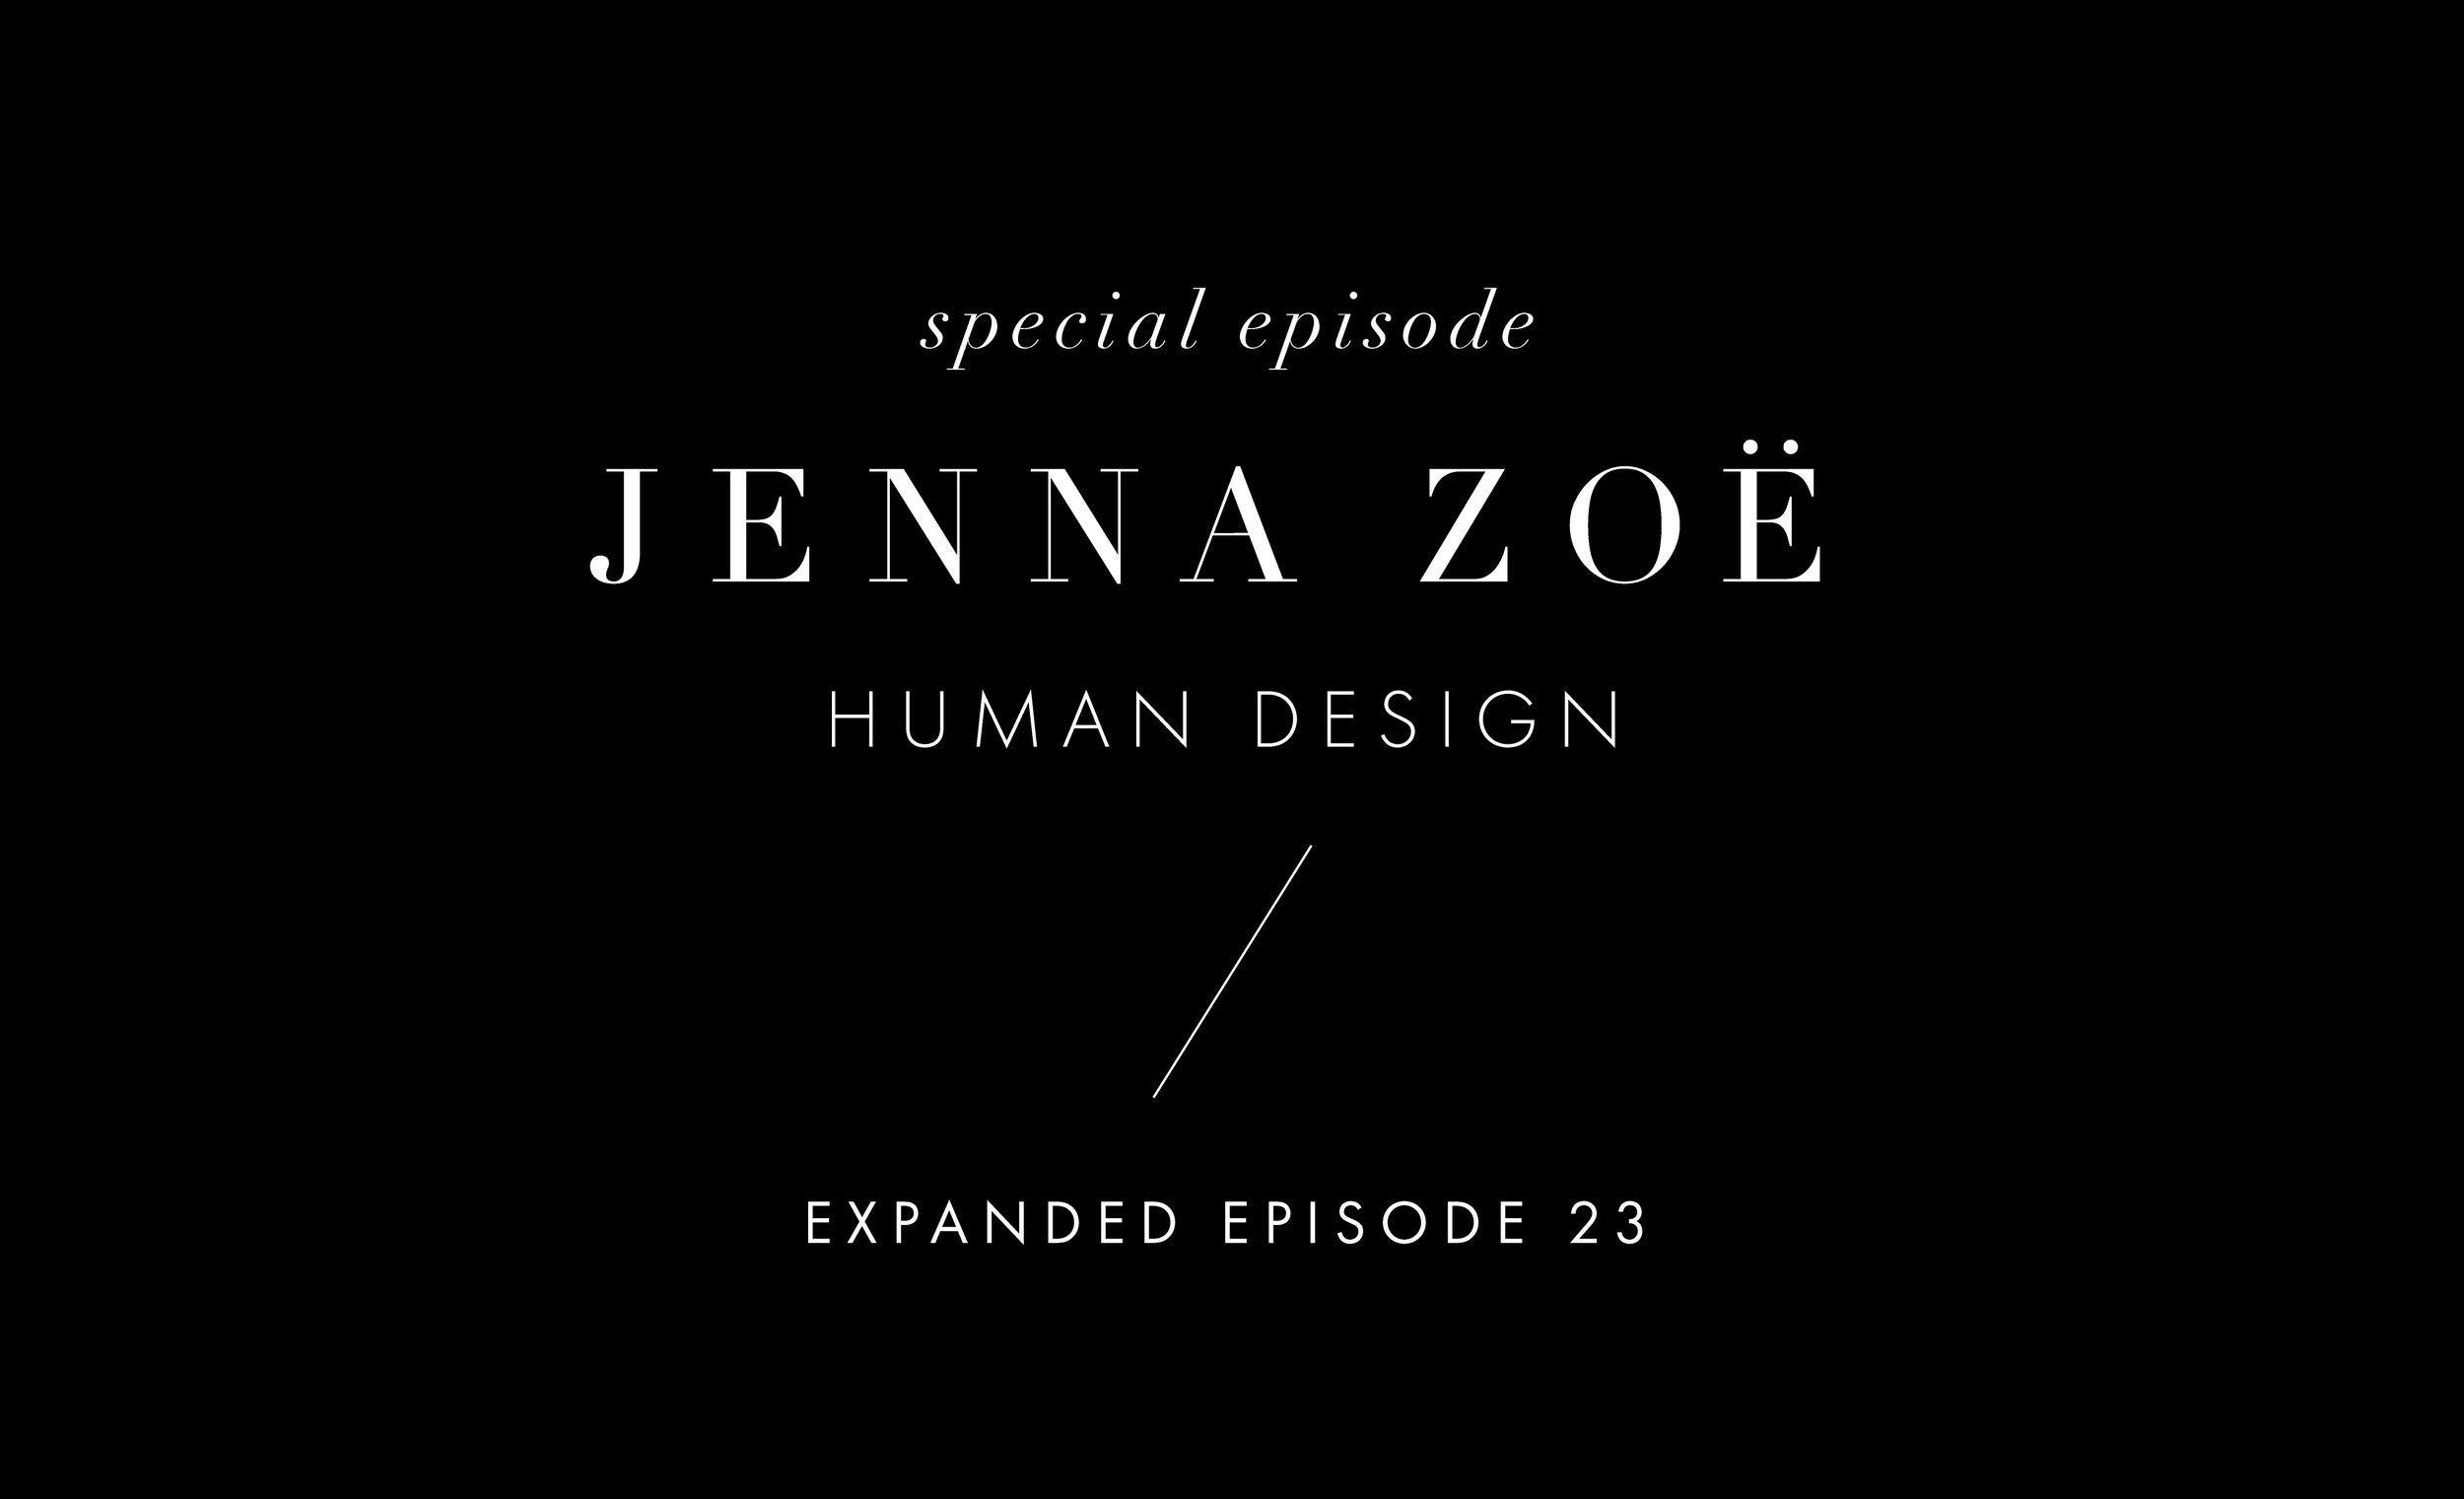 human design with jenna zoe